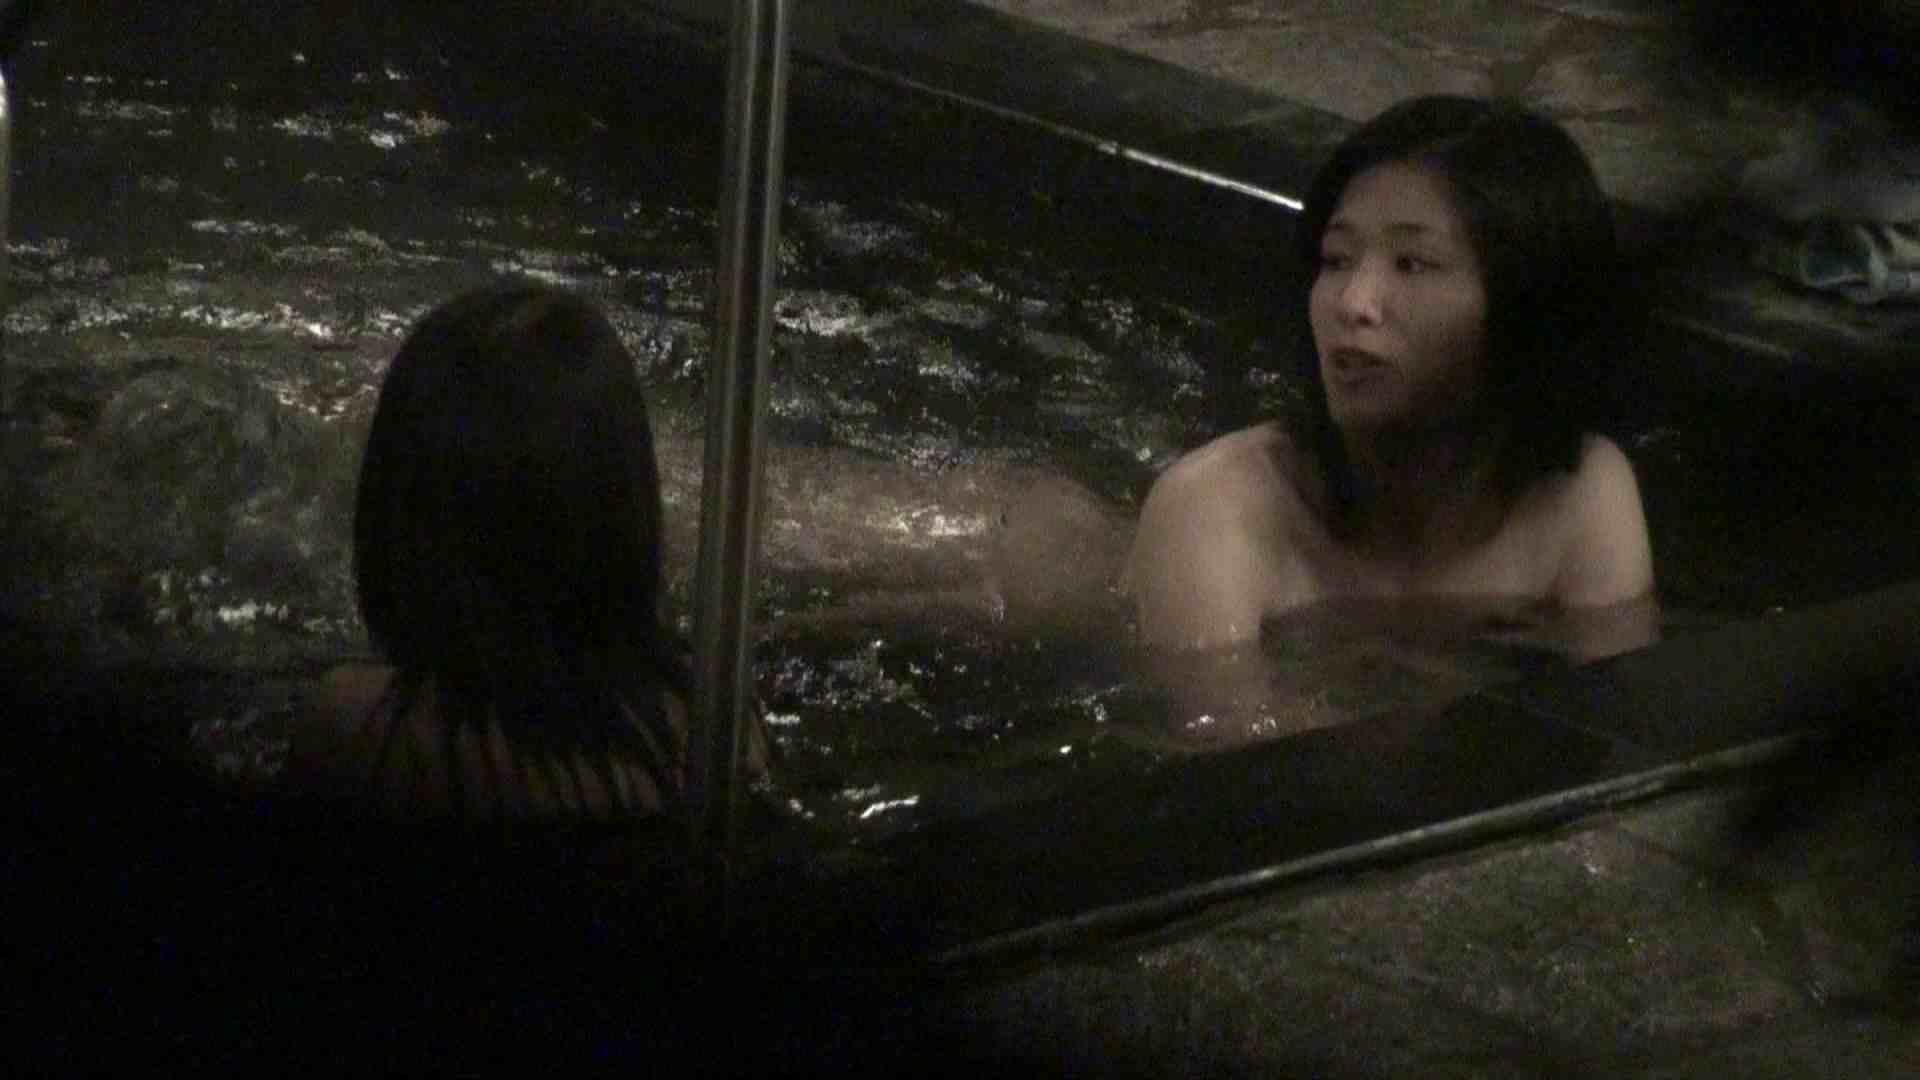 Aquaな露天風呂Vol.348 露天   HなOL  104pic 41